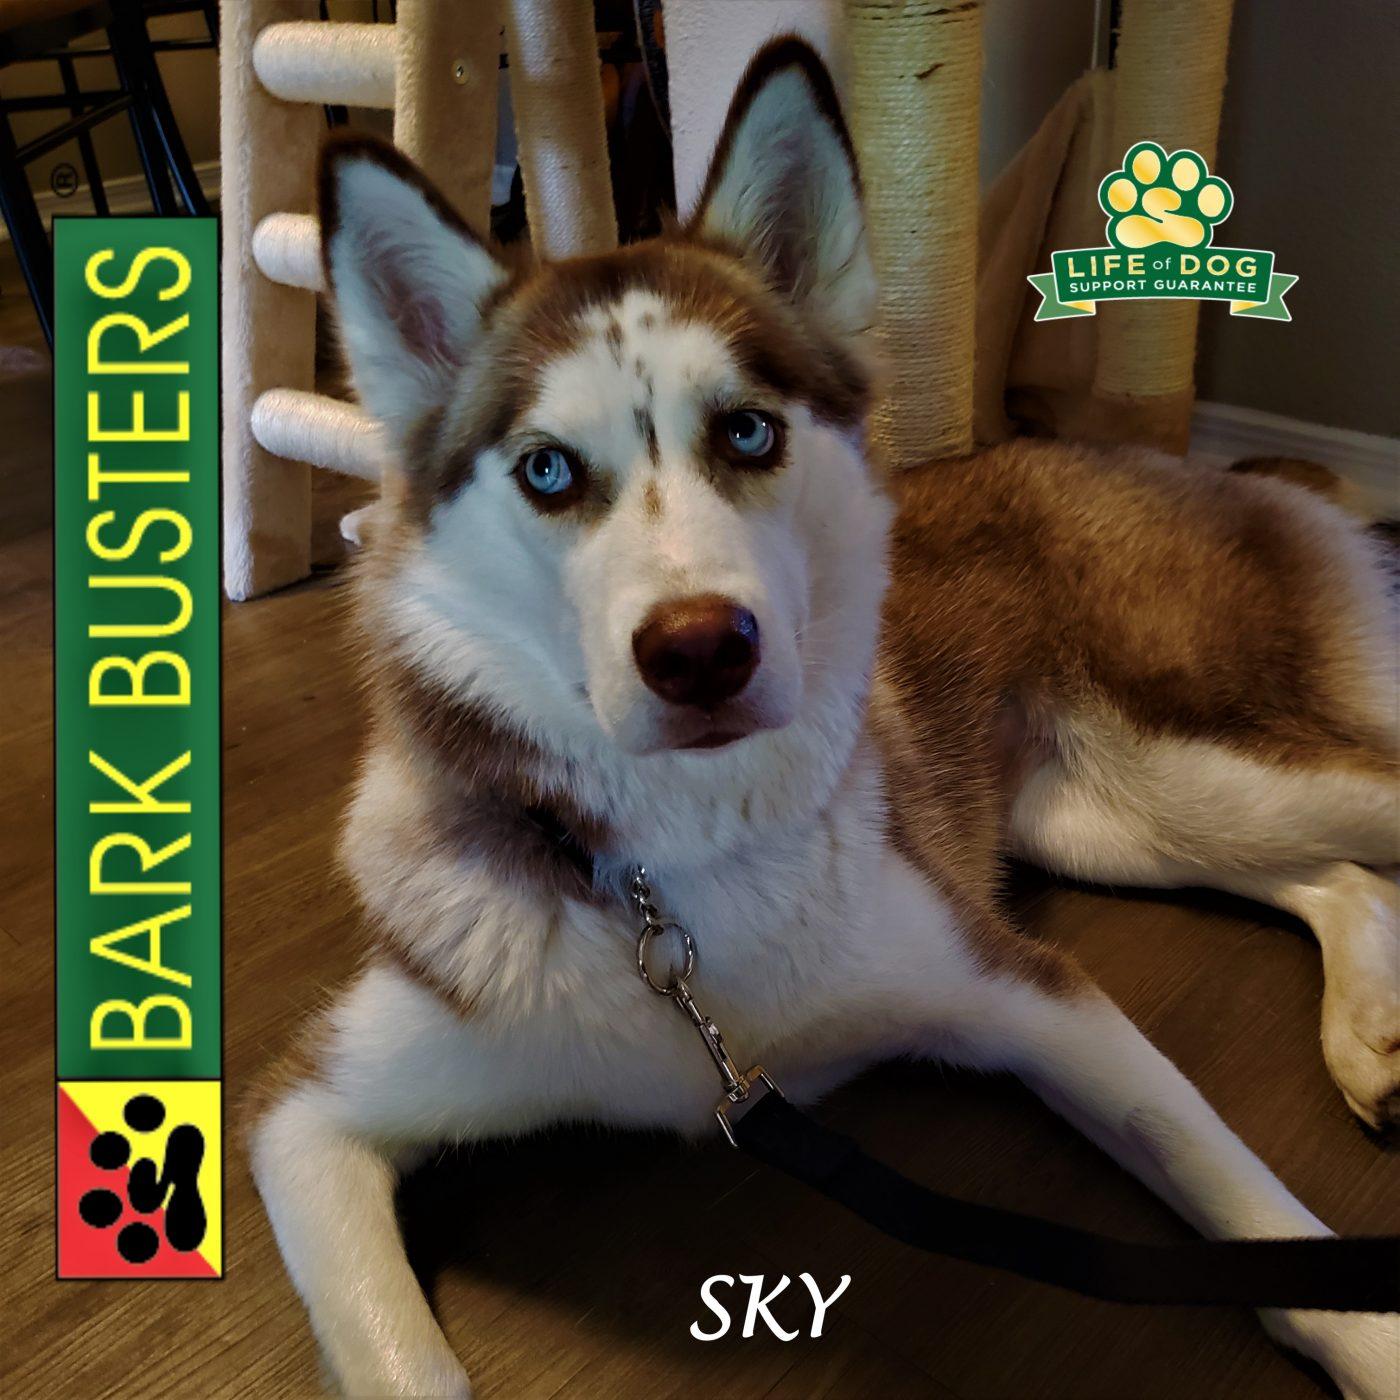 #husky #obediencetraining #leashtraining #dogtrainingaustin #dogtrainernearme #barkbusters #inhomedogtraining